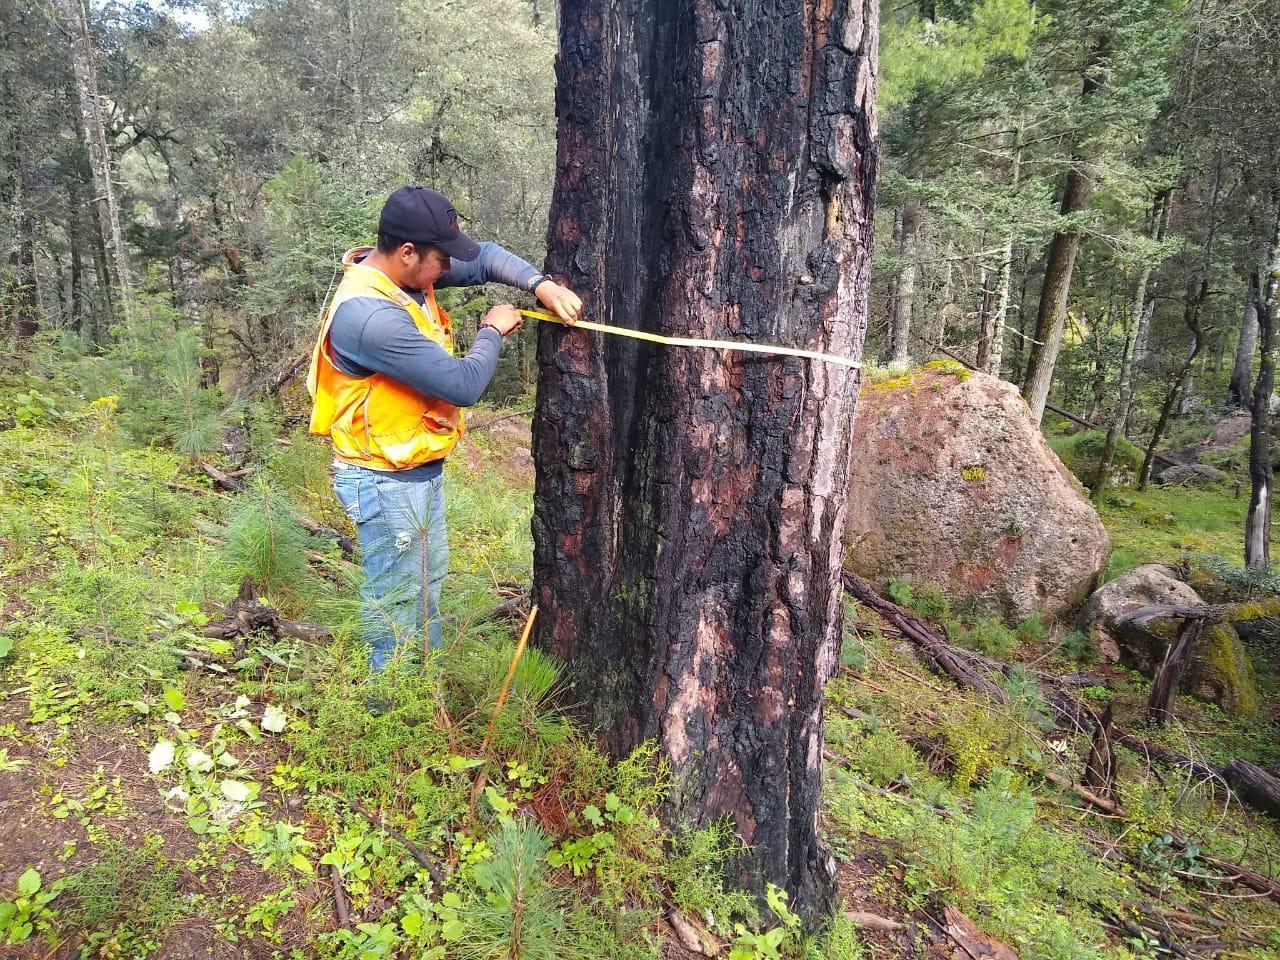 Bosques del noroeste de Durango